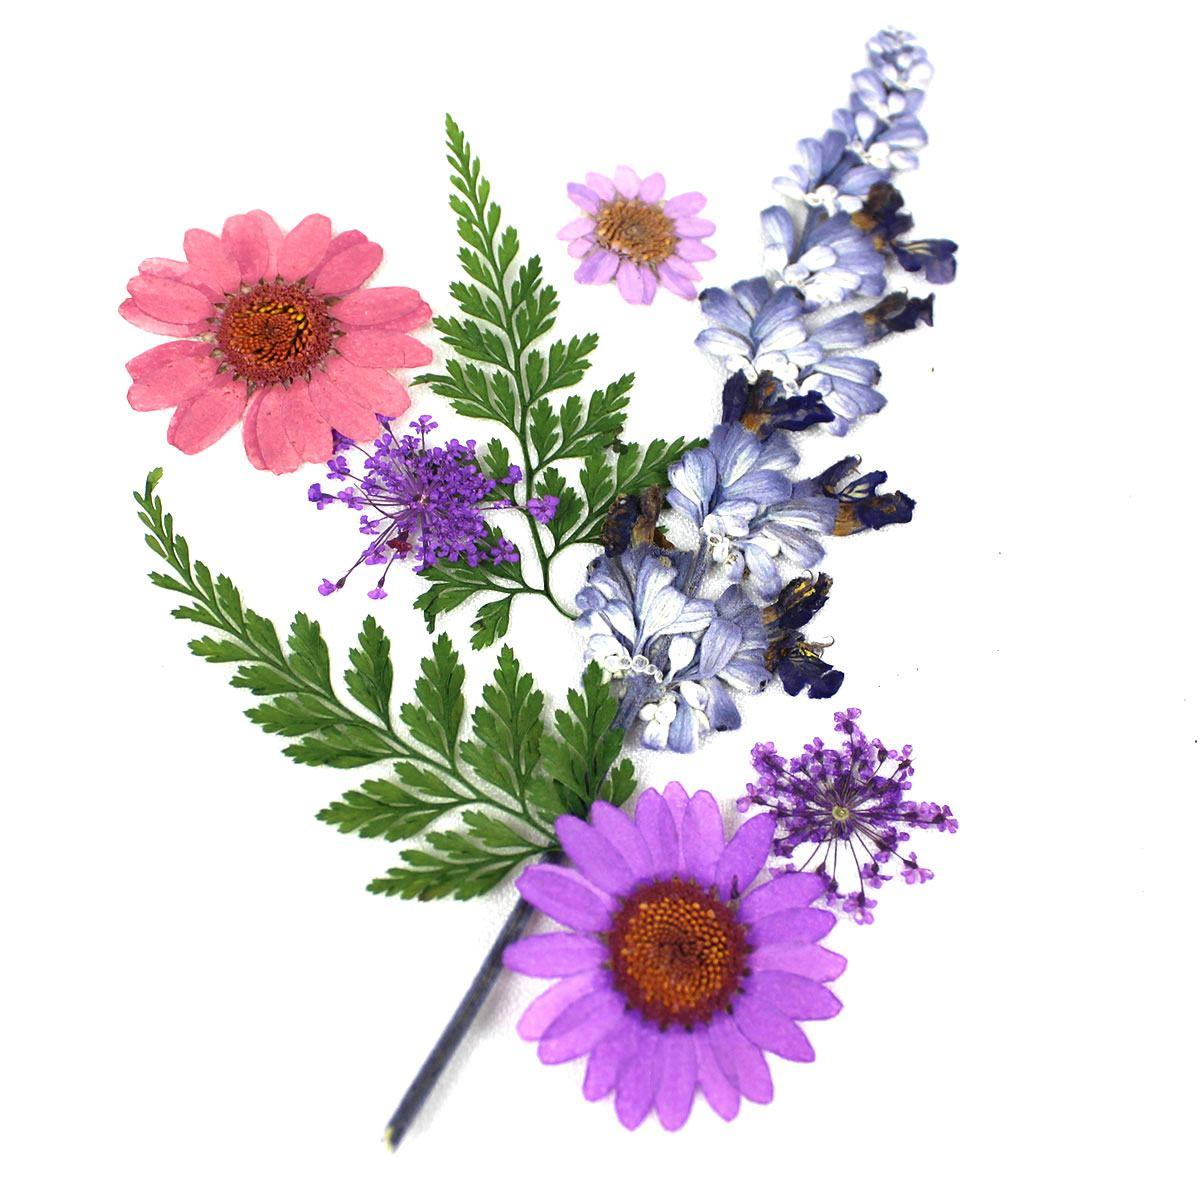 1-08A 押し花素材 押し花セット(A)